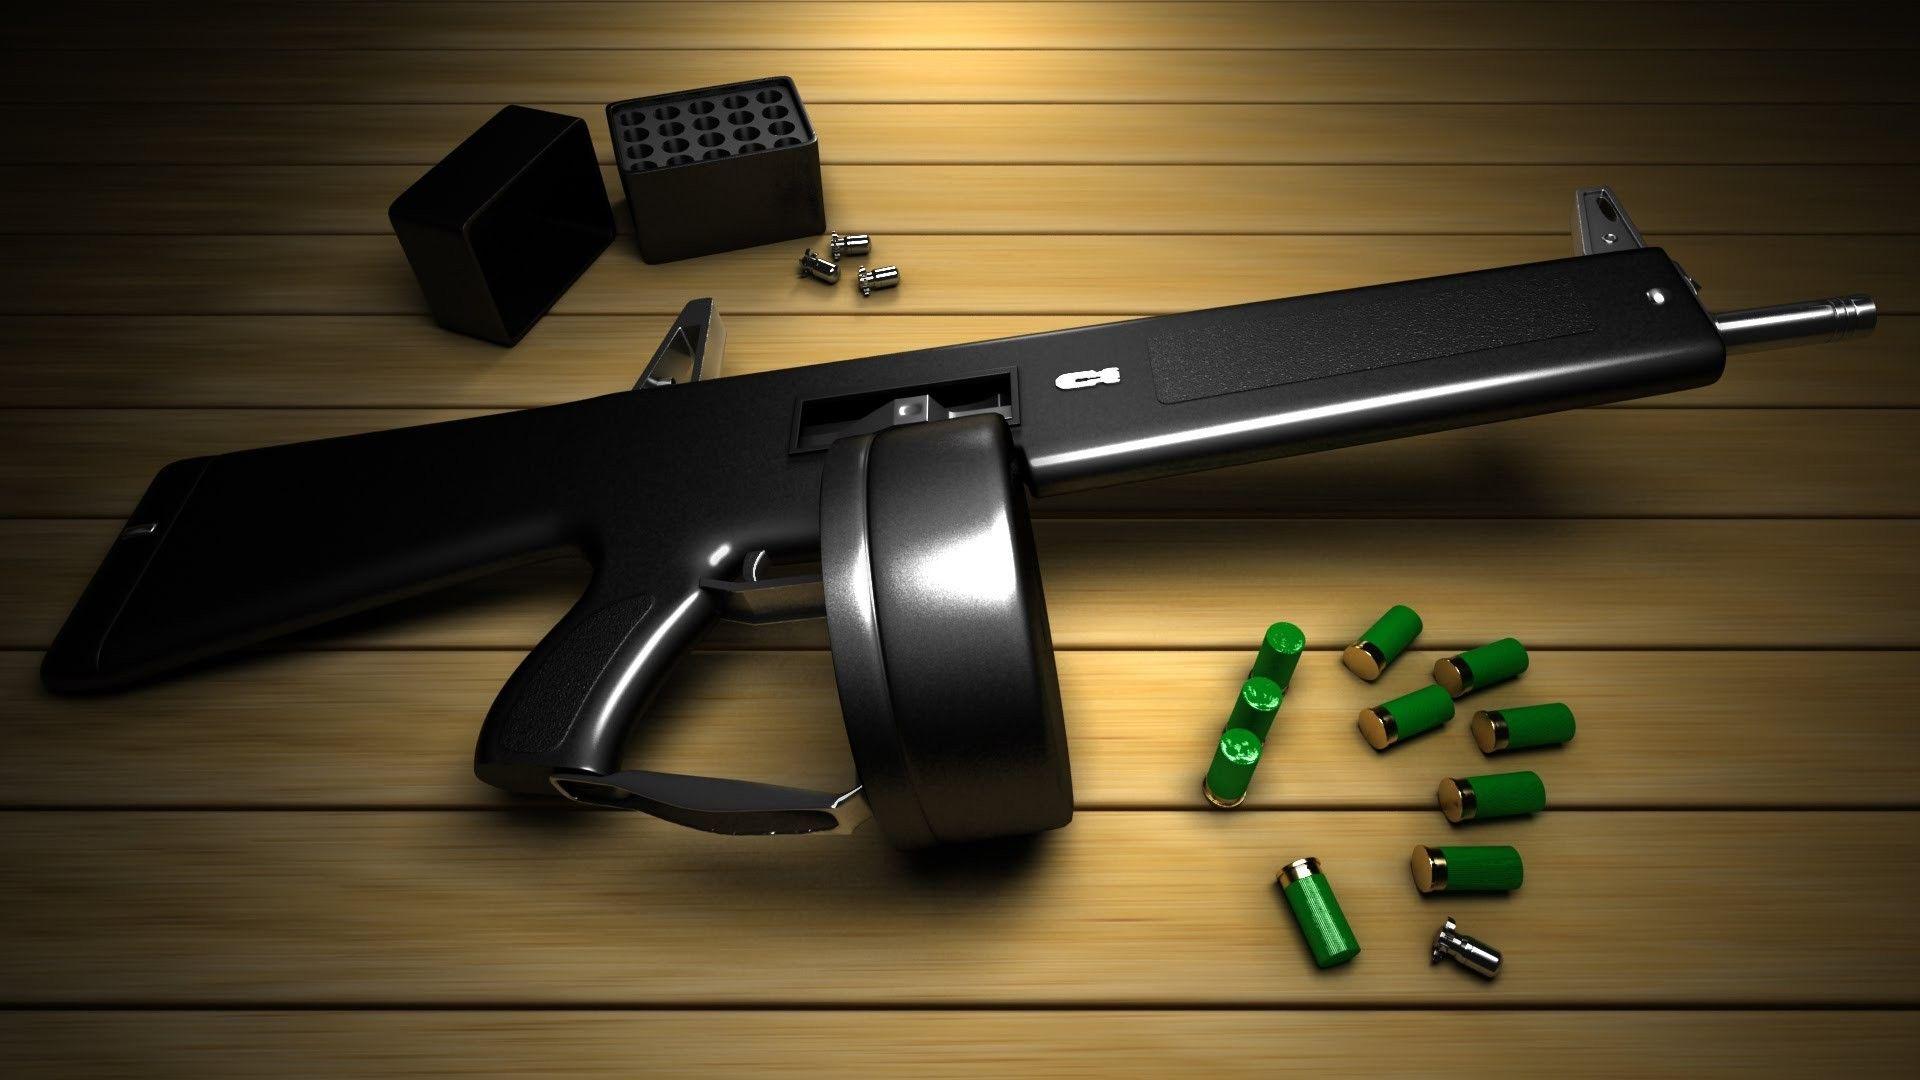 AA 12 Shotgun wallpaper Weapon wallpapers Pinterest